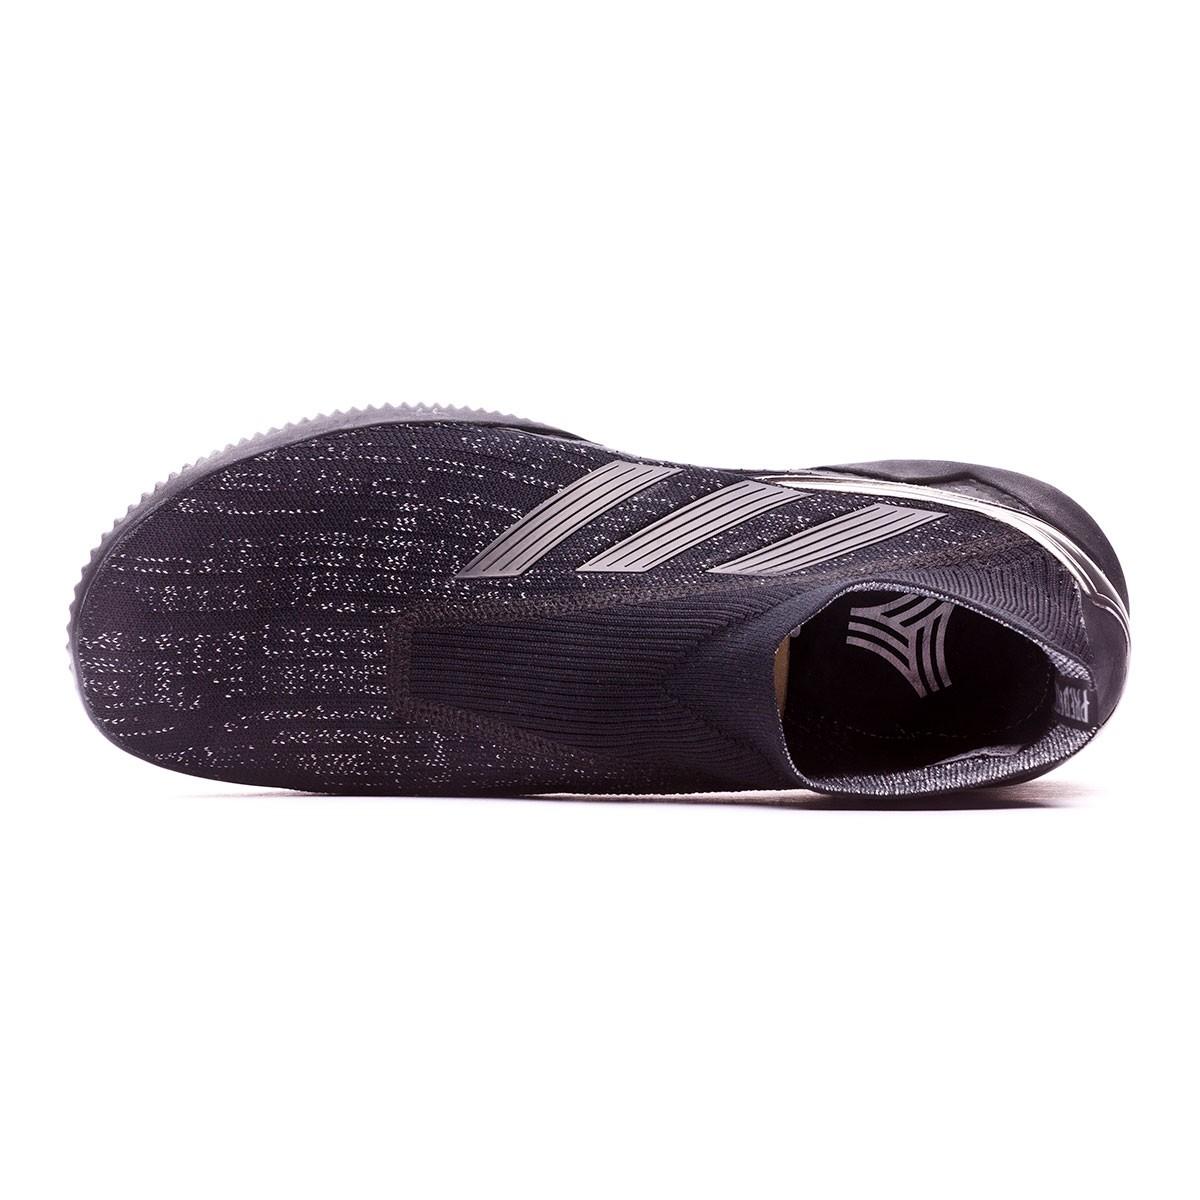 e9f9a0de689 Trainers adidas Predator Tango 18+ TR UltraBoost Core black-Silver -  Football store Fútbol Emotion